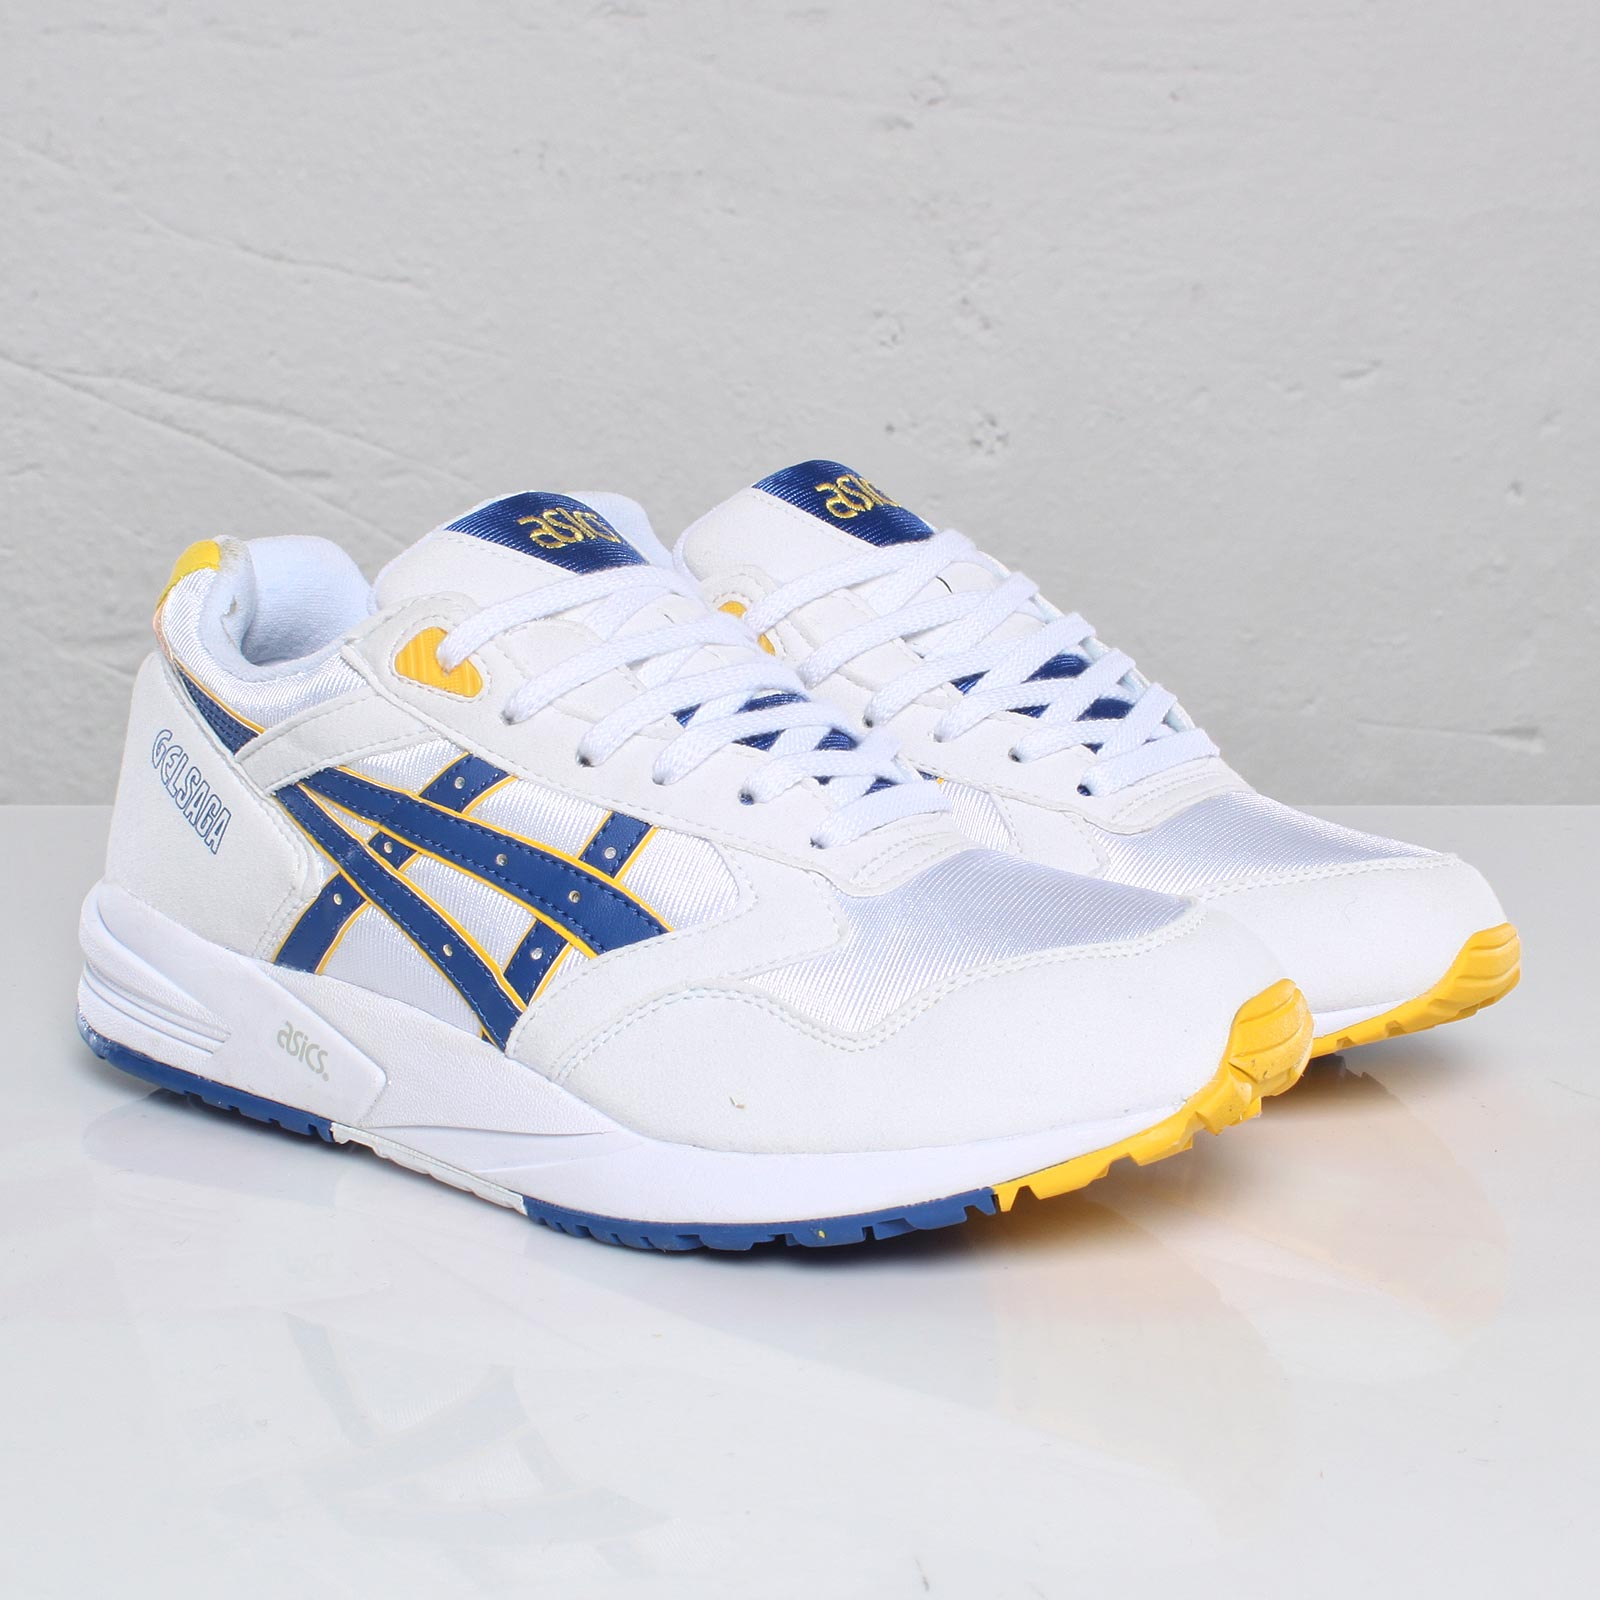 design intemporel 75ef5 6386f ASICS Tiger Gel Saga II - 102313 - Sneakersnstuff   sneakers ...